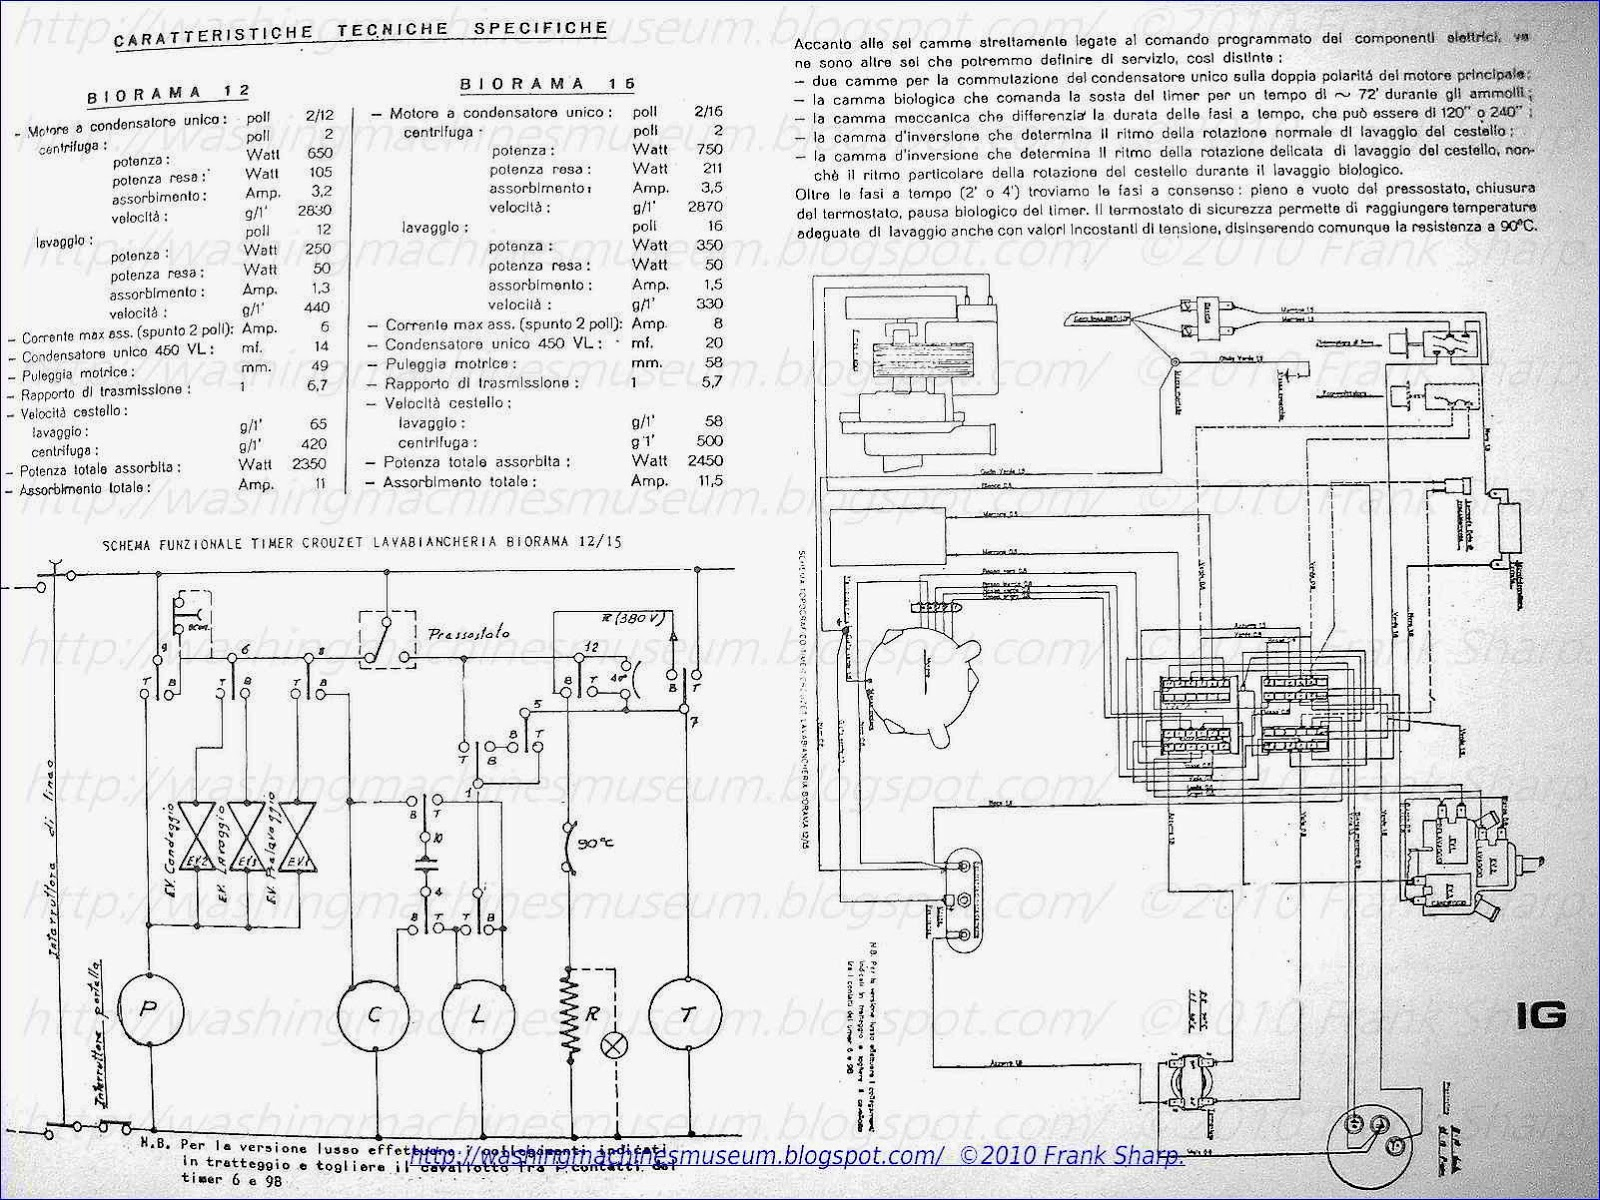 ariston washing machine wiring diagram data wiring diagram wiring diagram for hotpoint washing machine hotpoint washer [ 1600 x 1200 Pixel ]